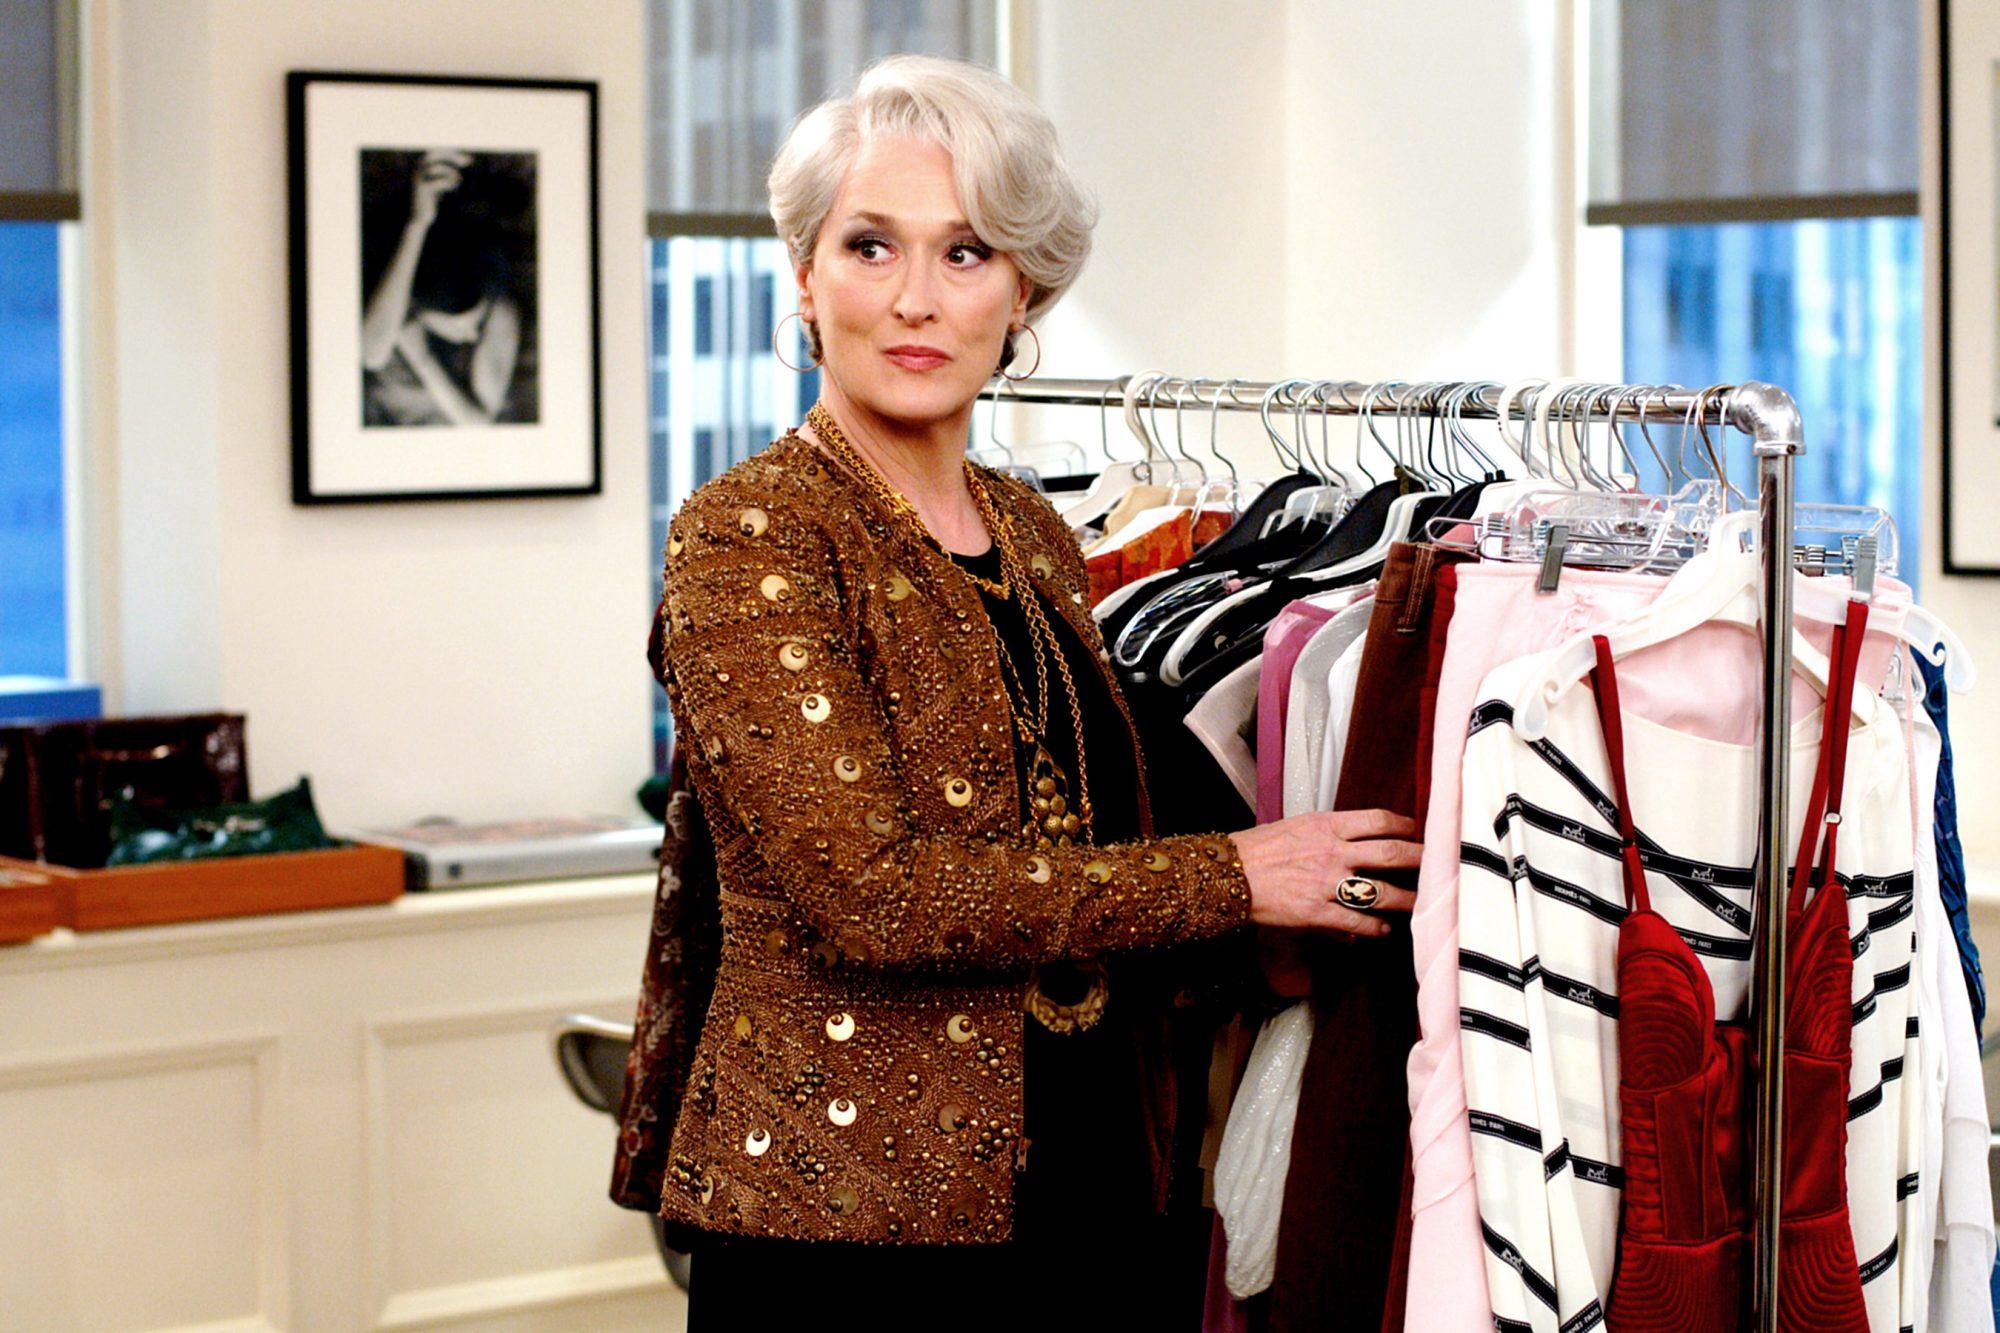 THE DEVIL WEARS PRADA, Meryl Streep (wearing a Bill Blass jacket), 2006, TM & Copyright (c) 20th Cen